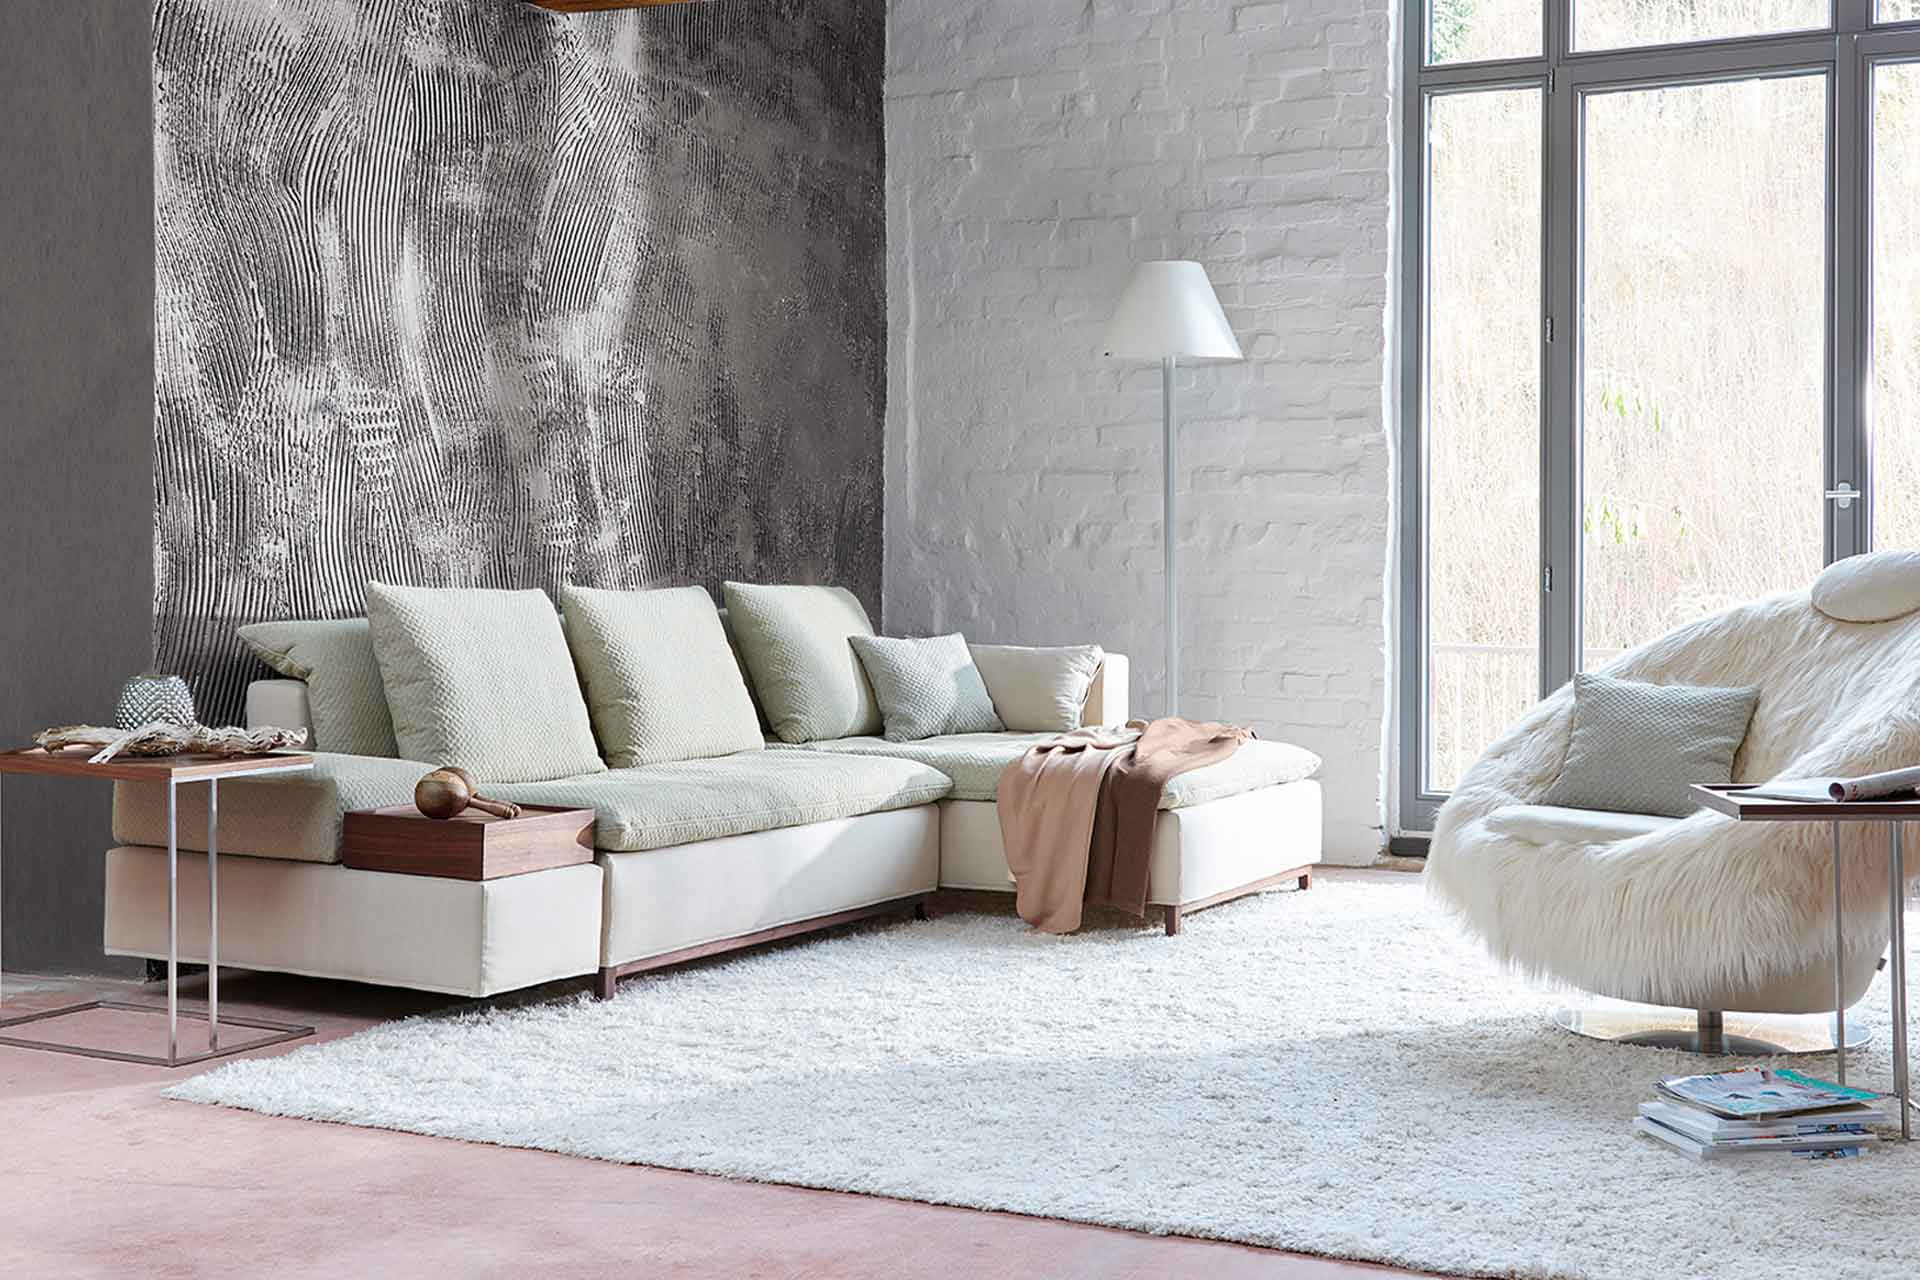 schlafsofaecke isla wohnopposition berlin. Black Bedroom Furniture Sets. Home Design Ideas